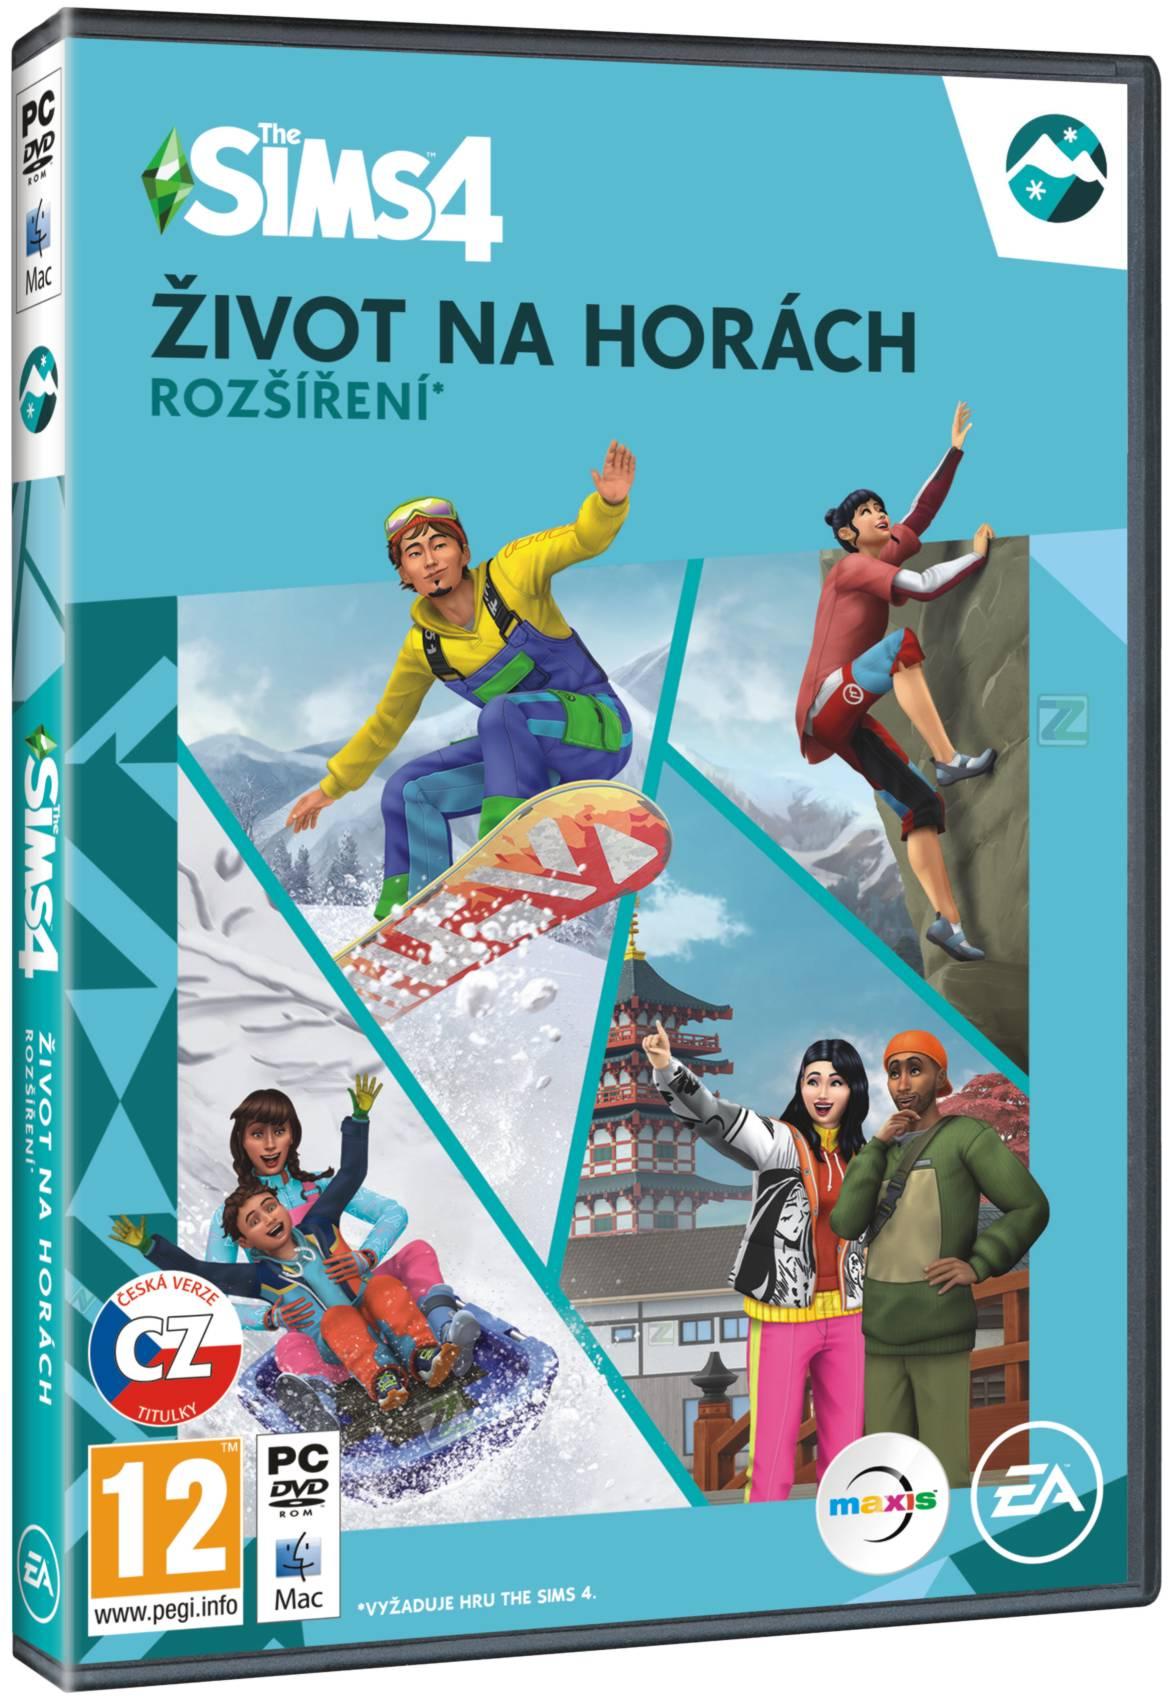 The Sims 4: Život na horách - PC